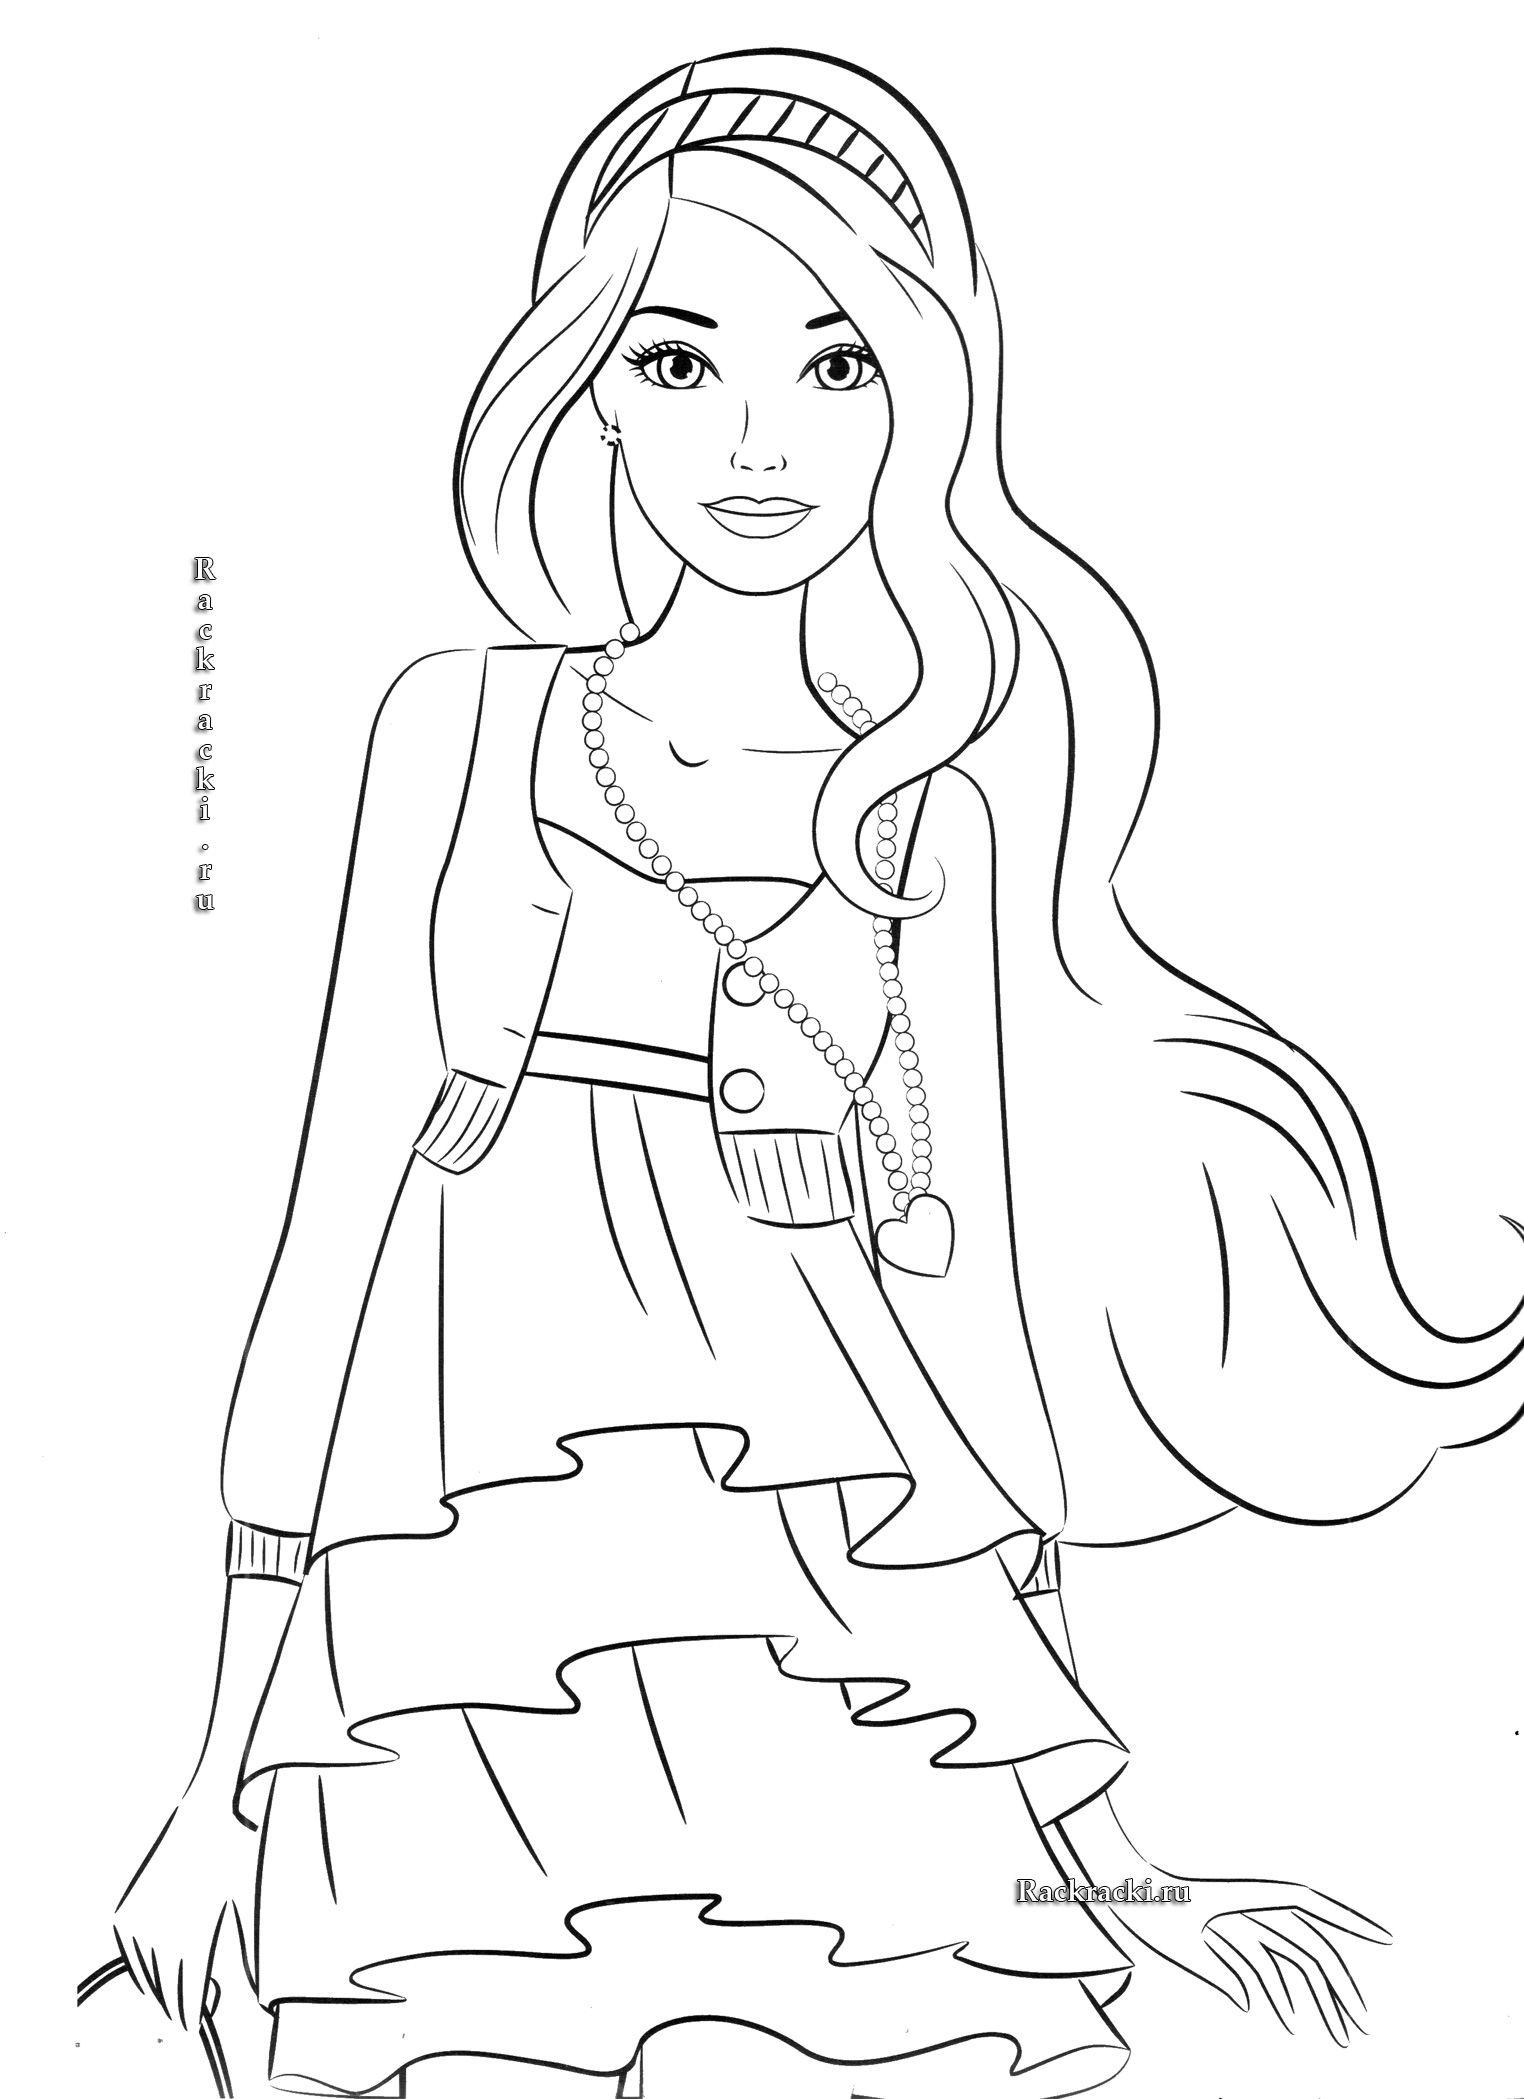 Barbie Princessa Raskraska Barbie Coloring Pages Cute Coloring Pages Princess Coloring Pages